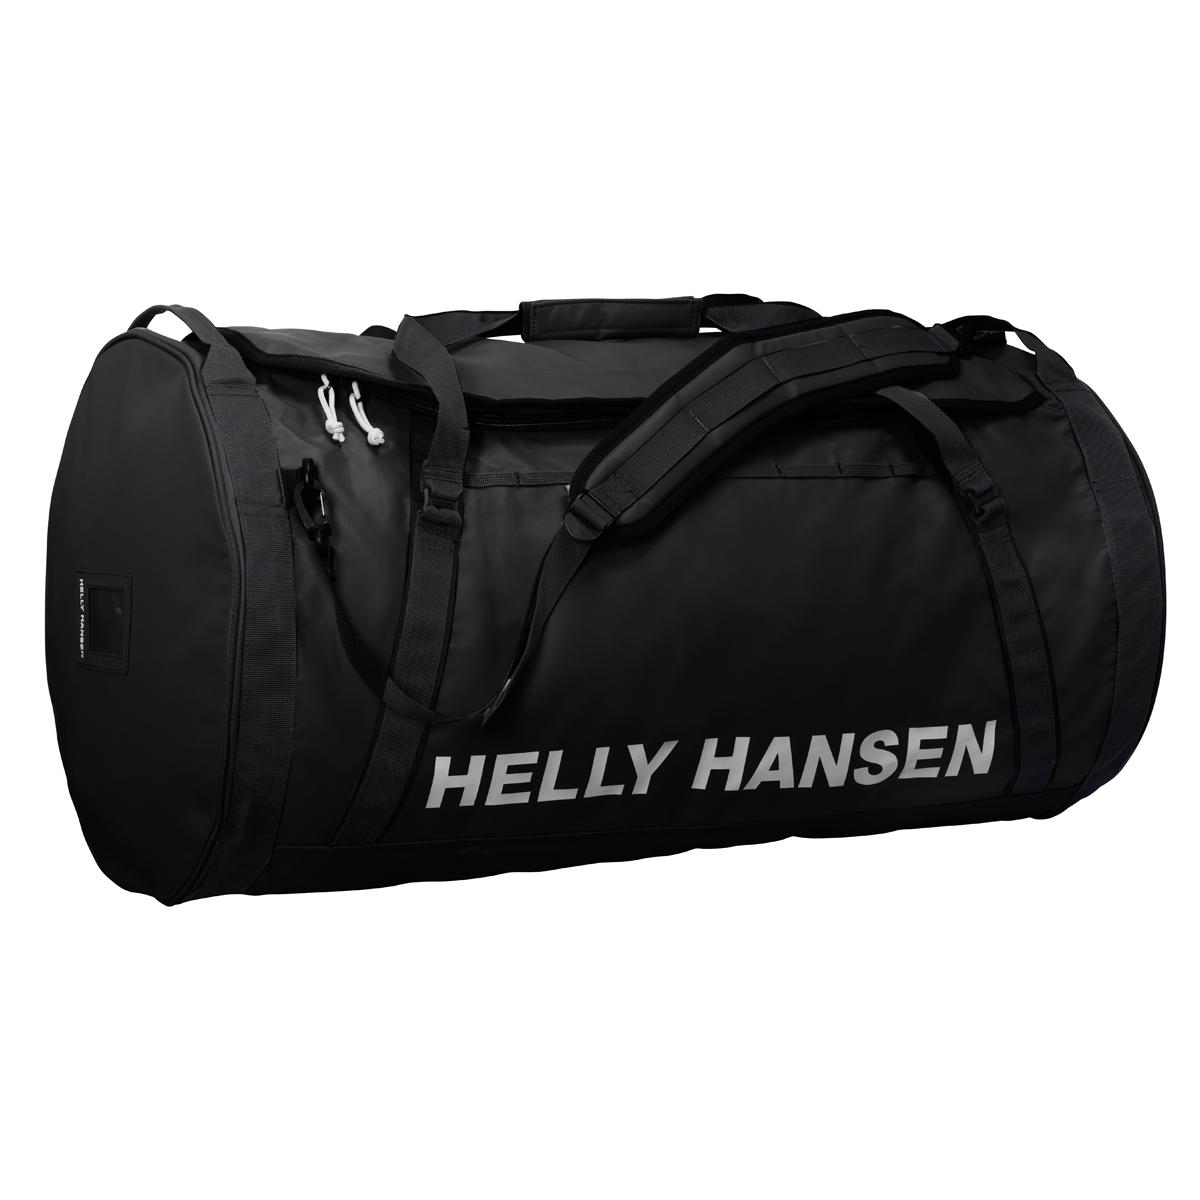 HELLY HANSEN  DUFFEL BAG 2 50L (68005)